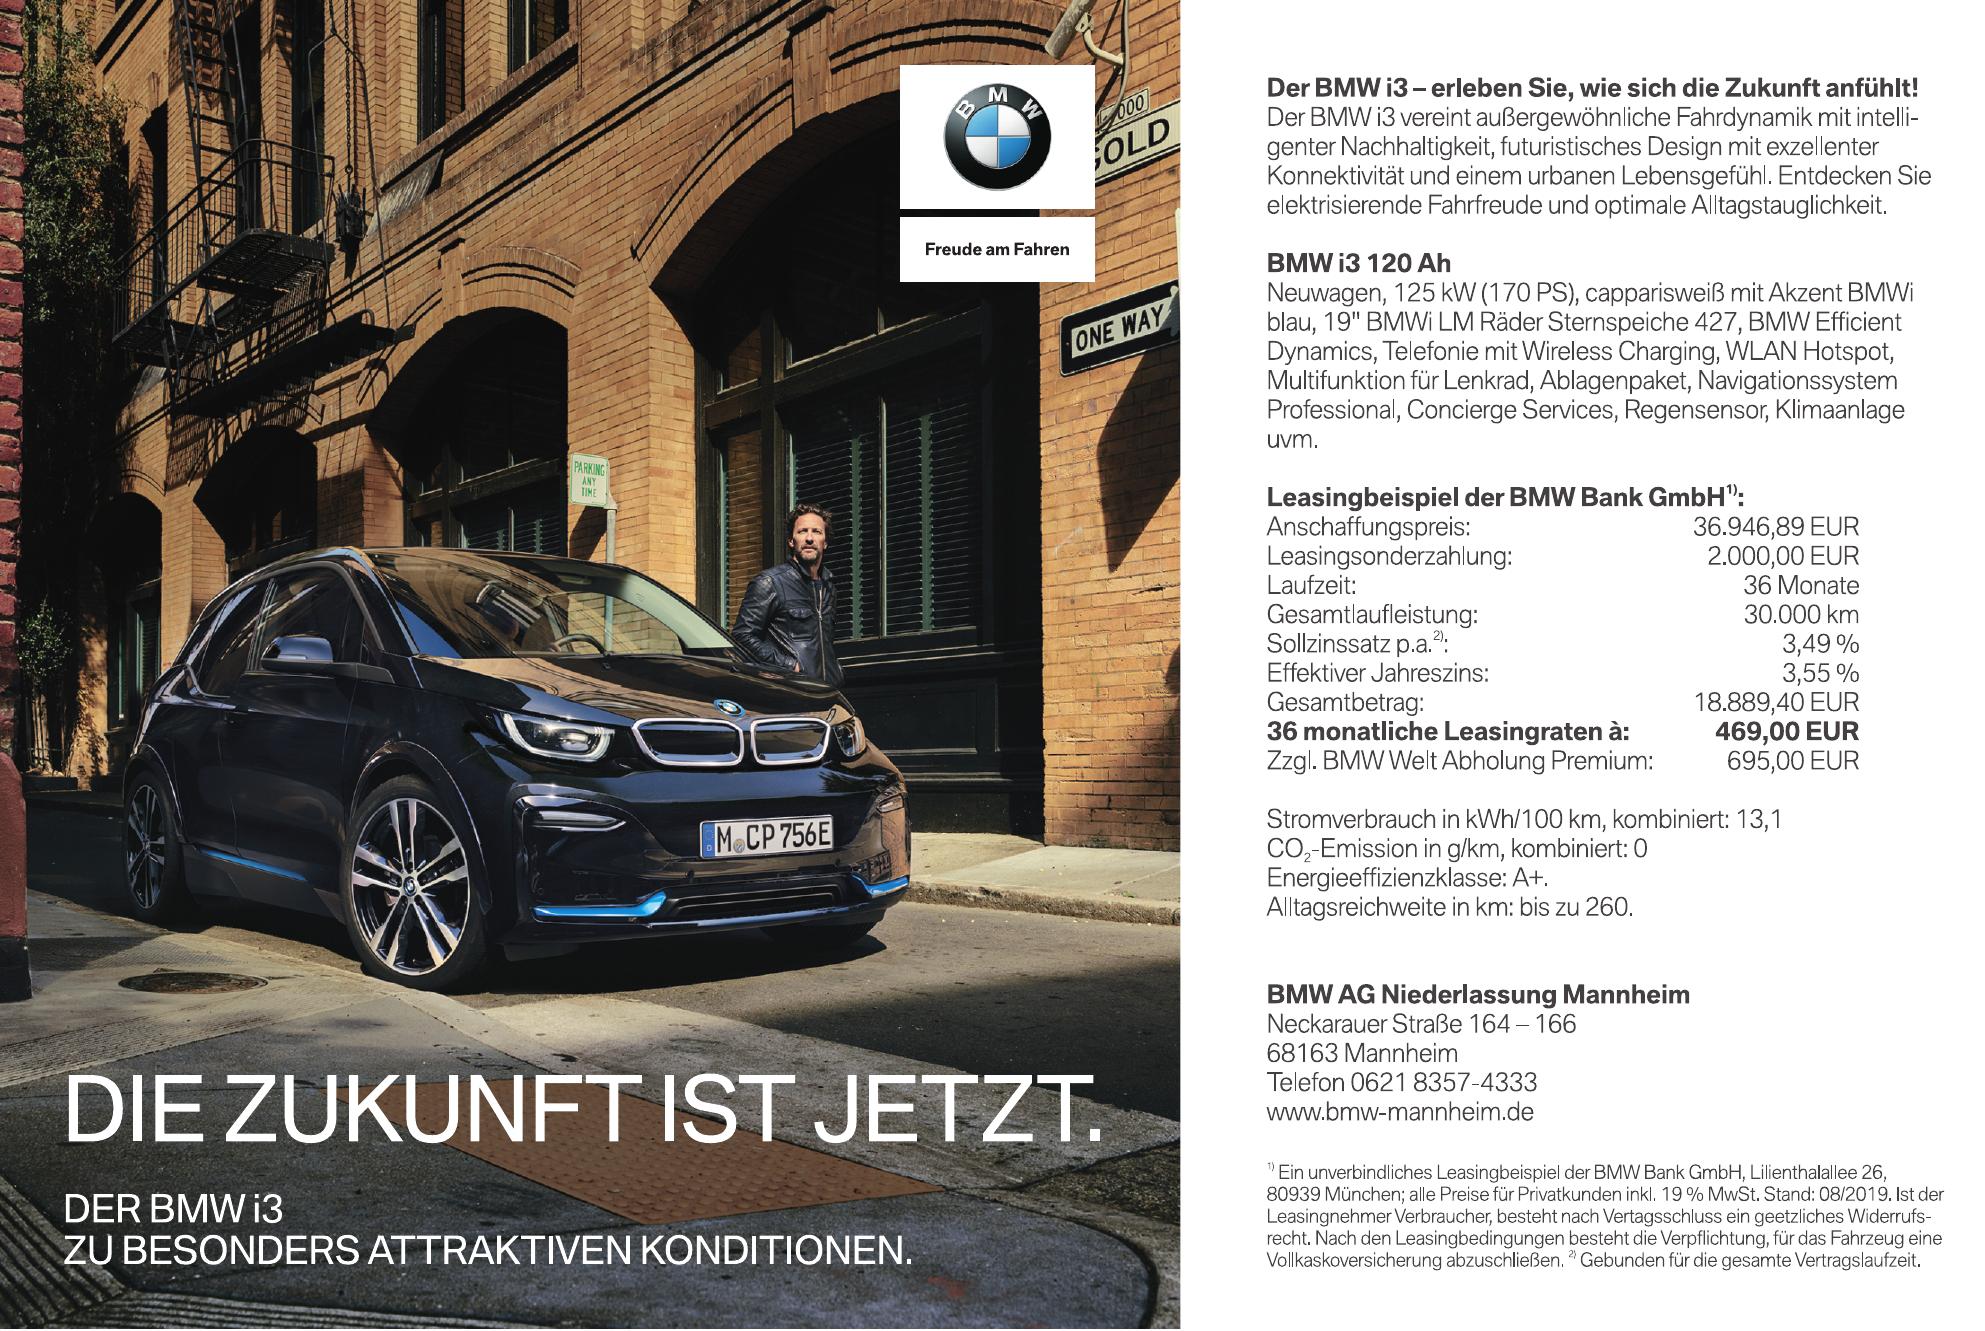 BMW AG Niederlassung Mannheim